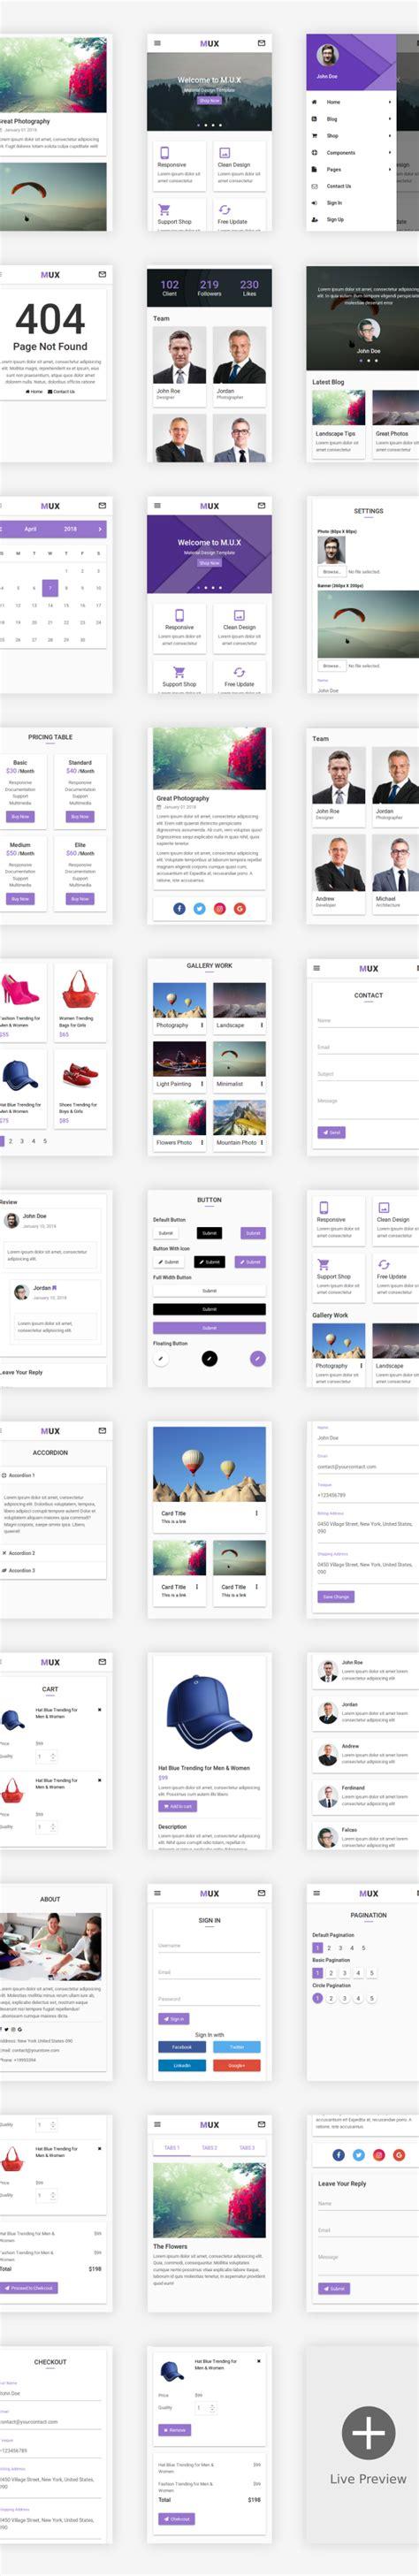 home design web app mux material design web app ui kit mobile template by